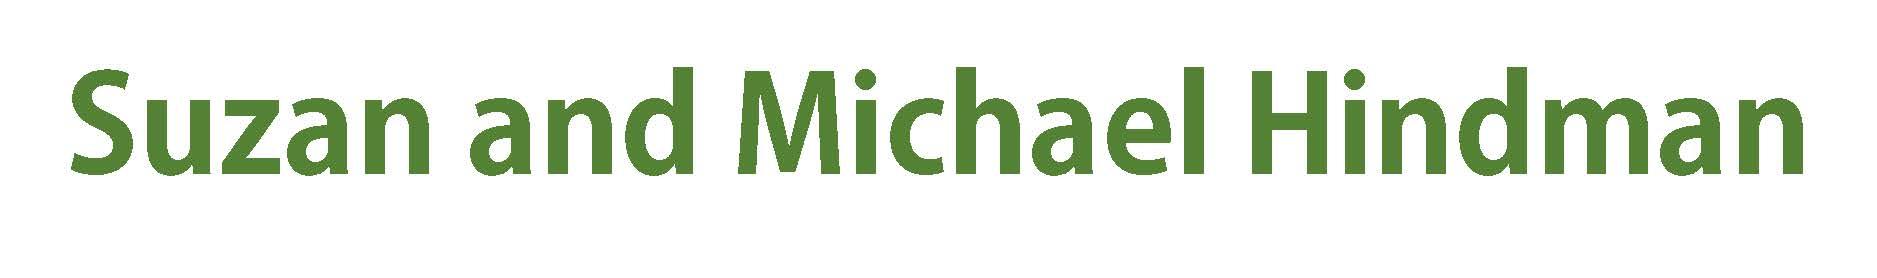 Suzan and Michael Hindman  logo.jpg